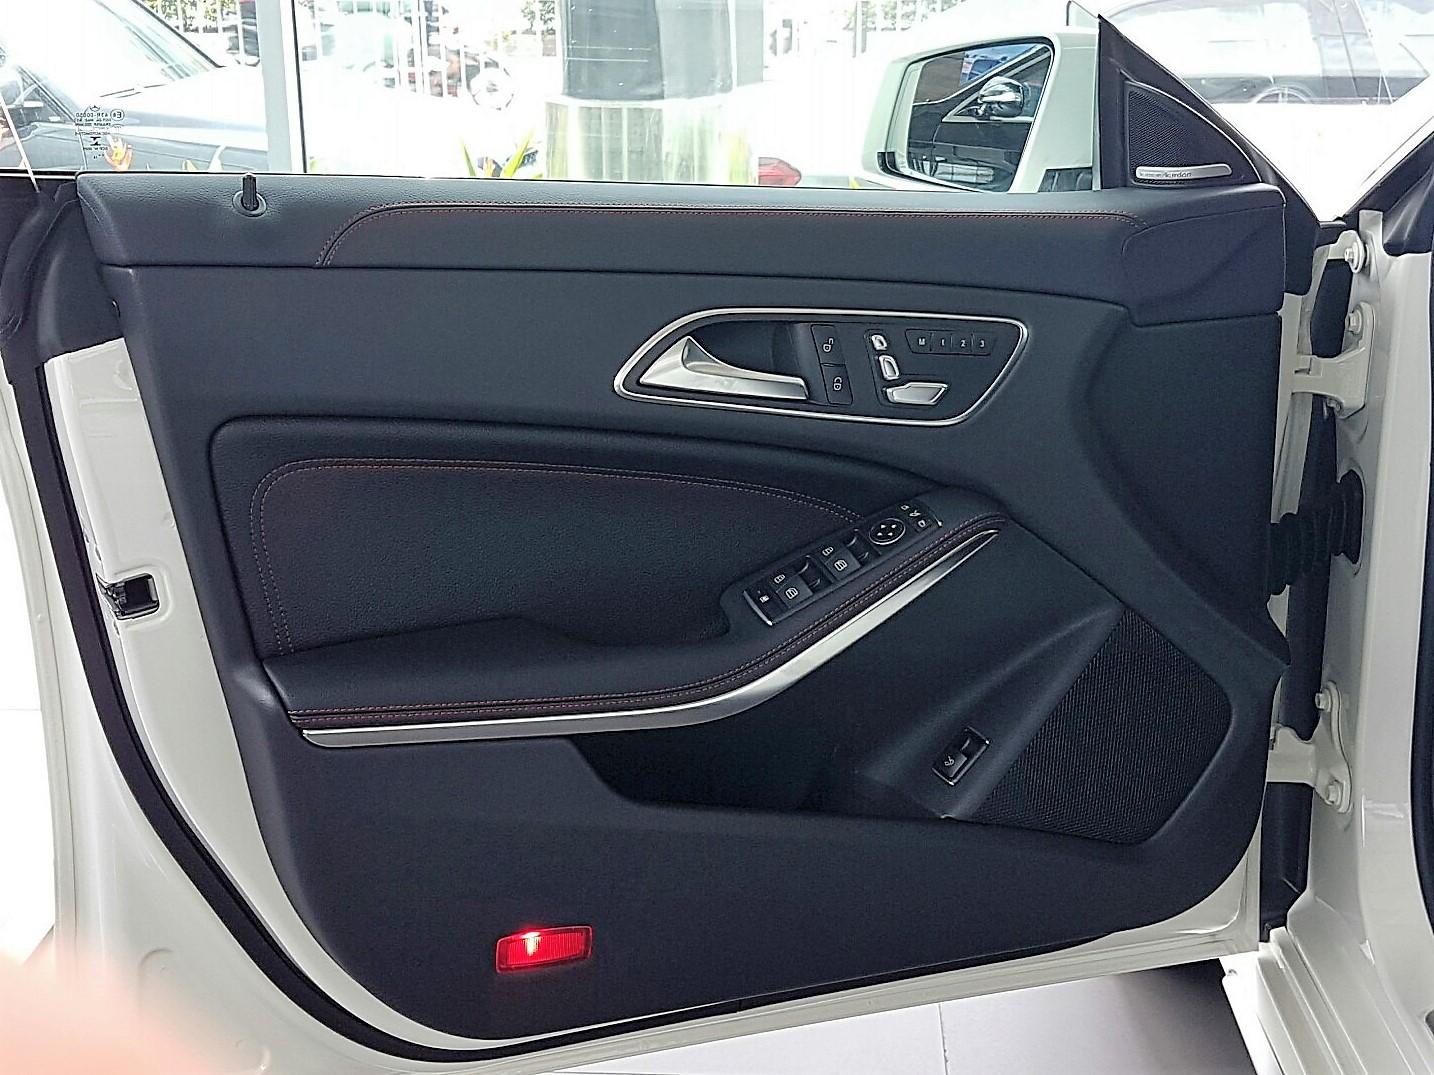 Xe Mercedes Benz CLA45 AMG màu trắng new model 016